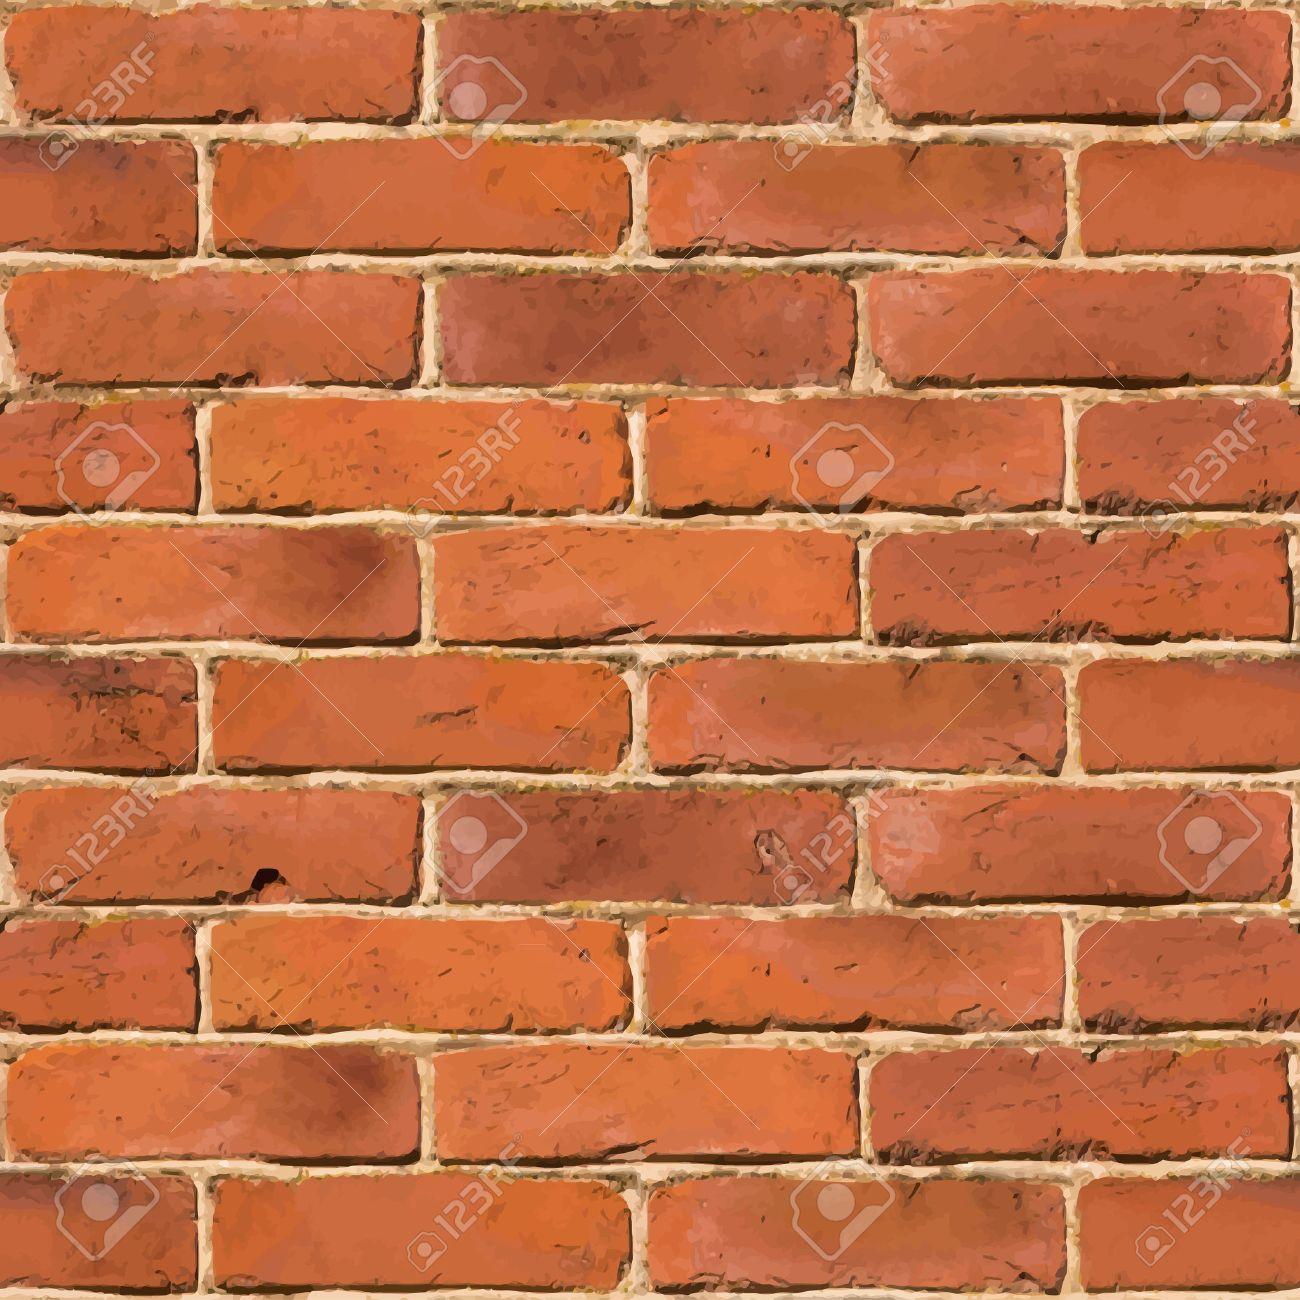 Red brick wall seamless vector texture - 29903375